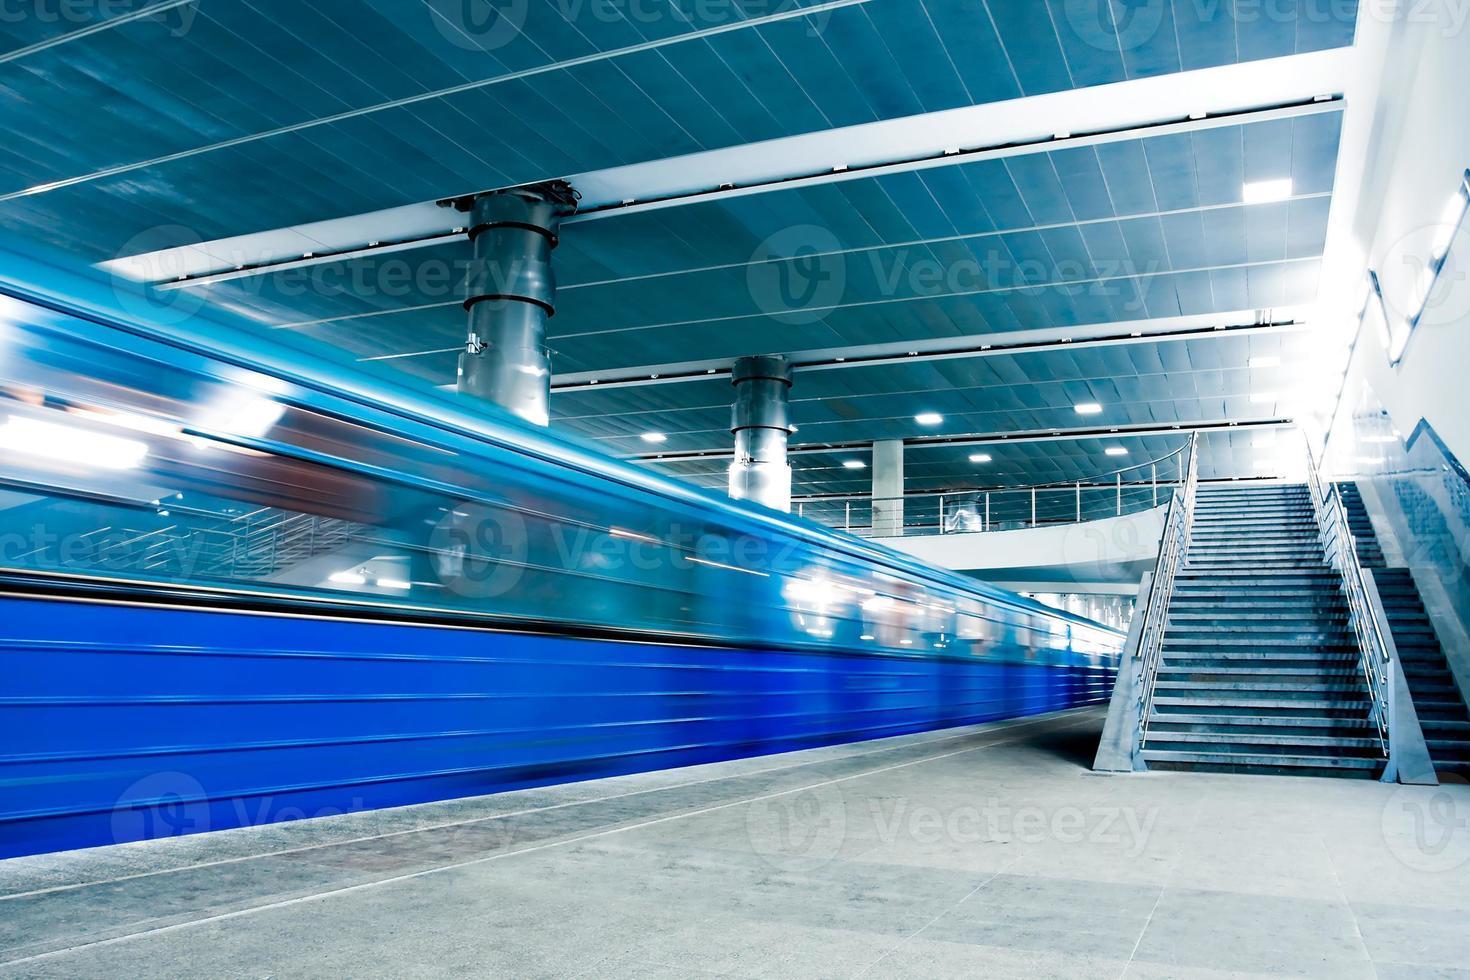 Train roulant bleu avec escalier photo